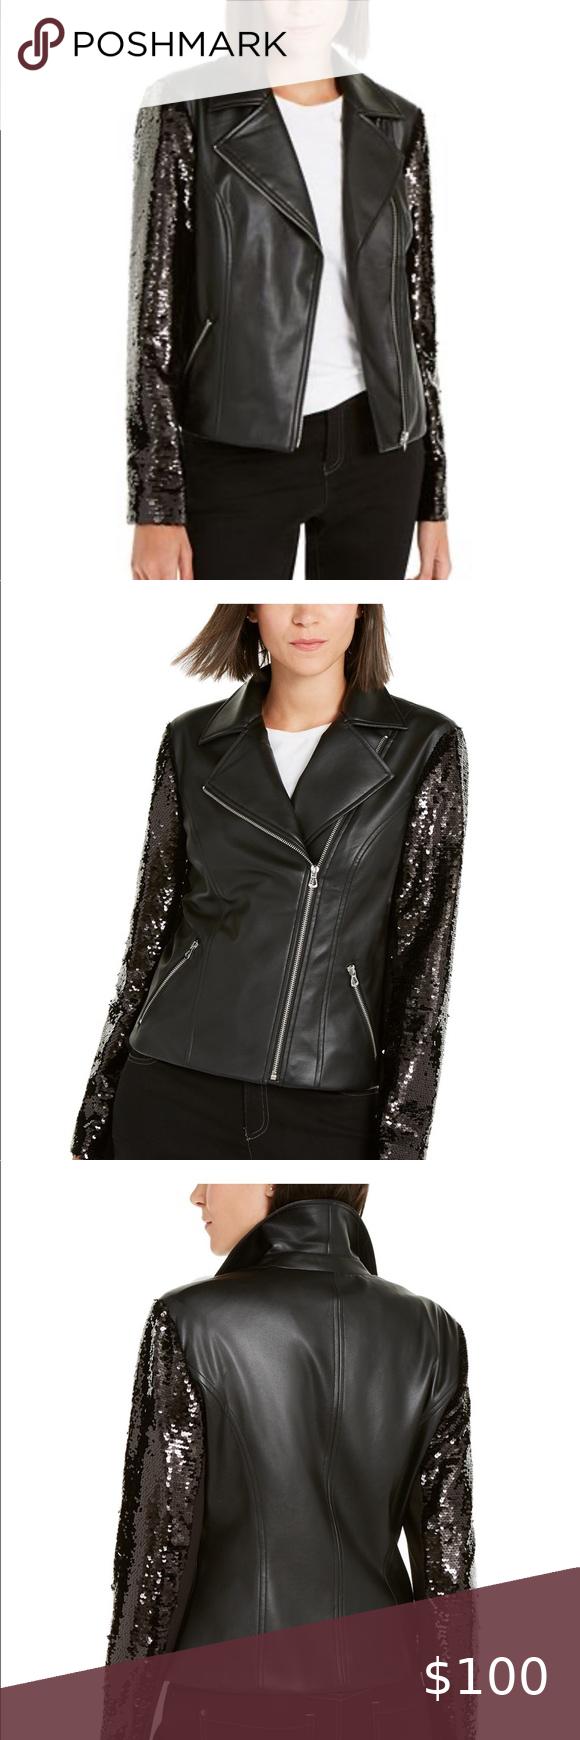 I N C Faux Leather Moto Jacket W Sequined Sleeves Faux Leather Moto Jacket White Leather Jacket Floral Knit Dress [ 1740 x 580 Pixel ]